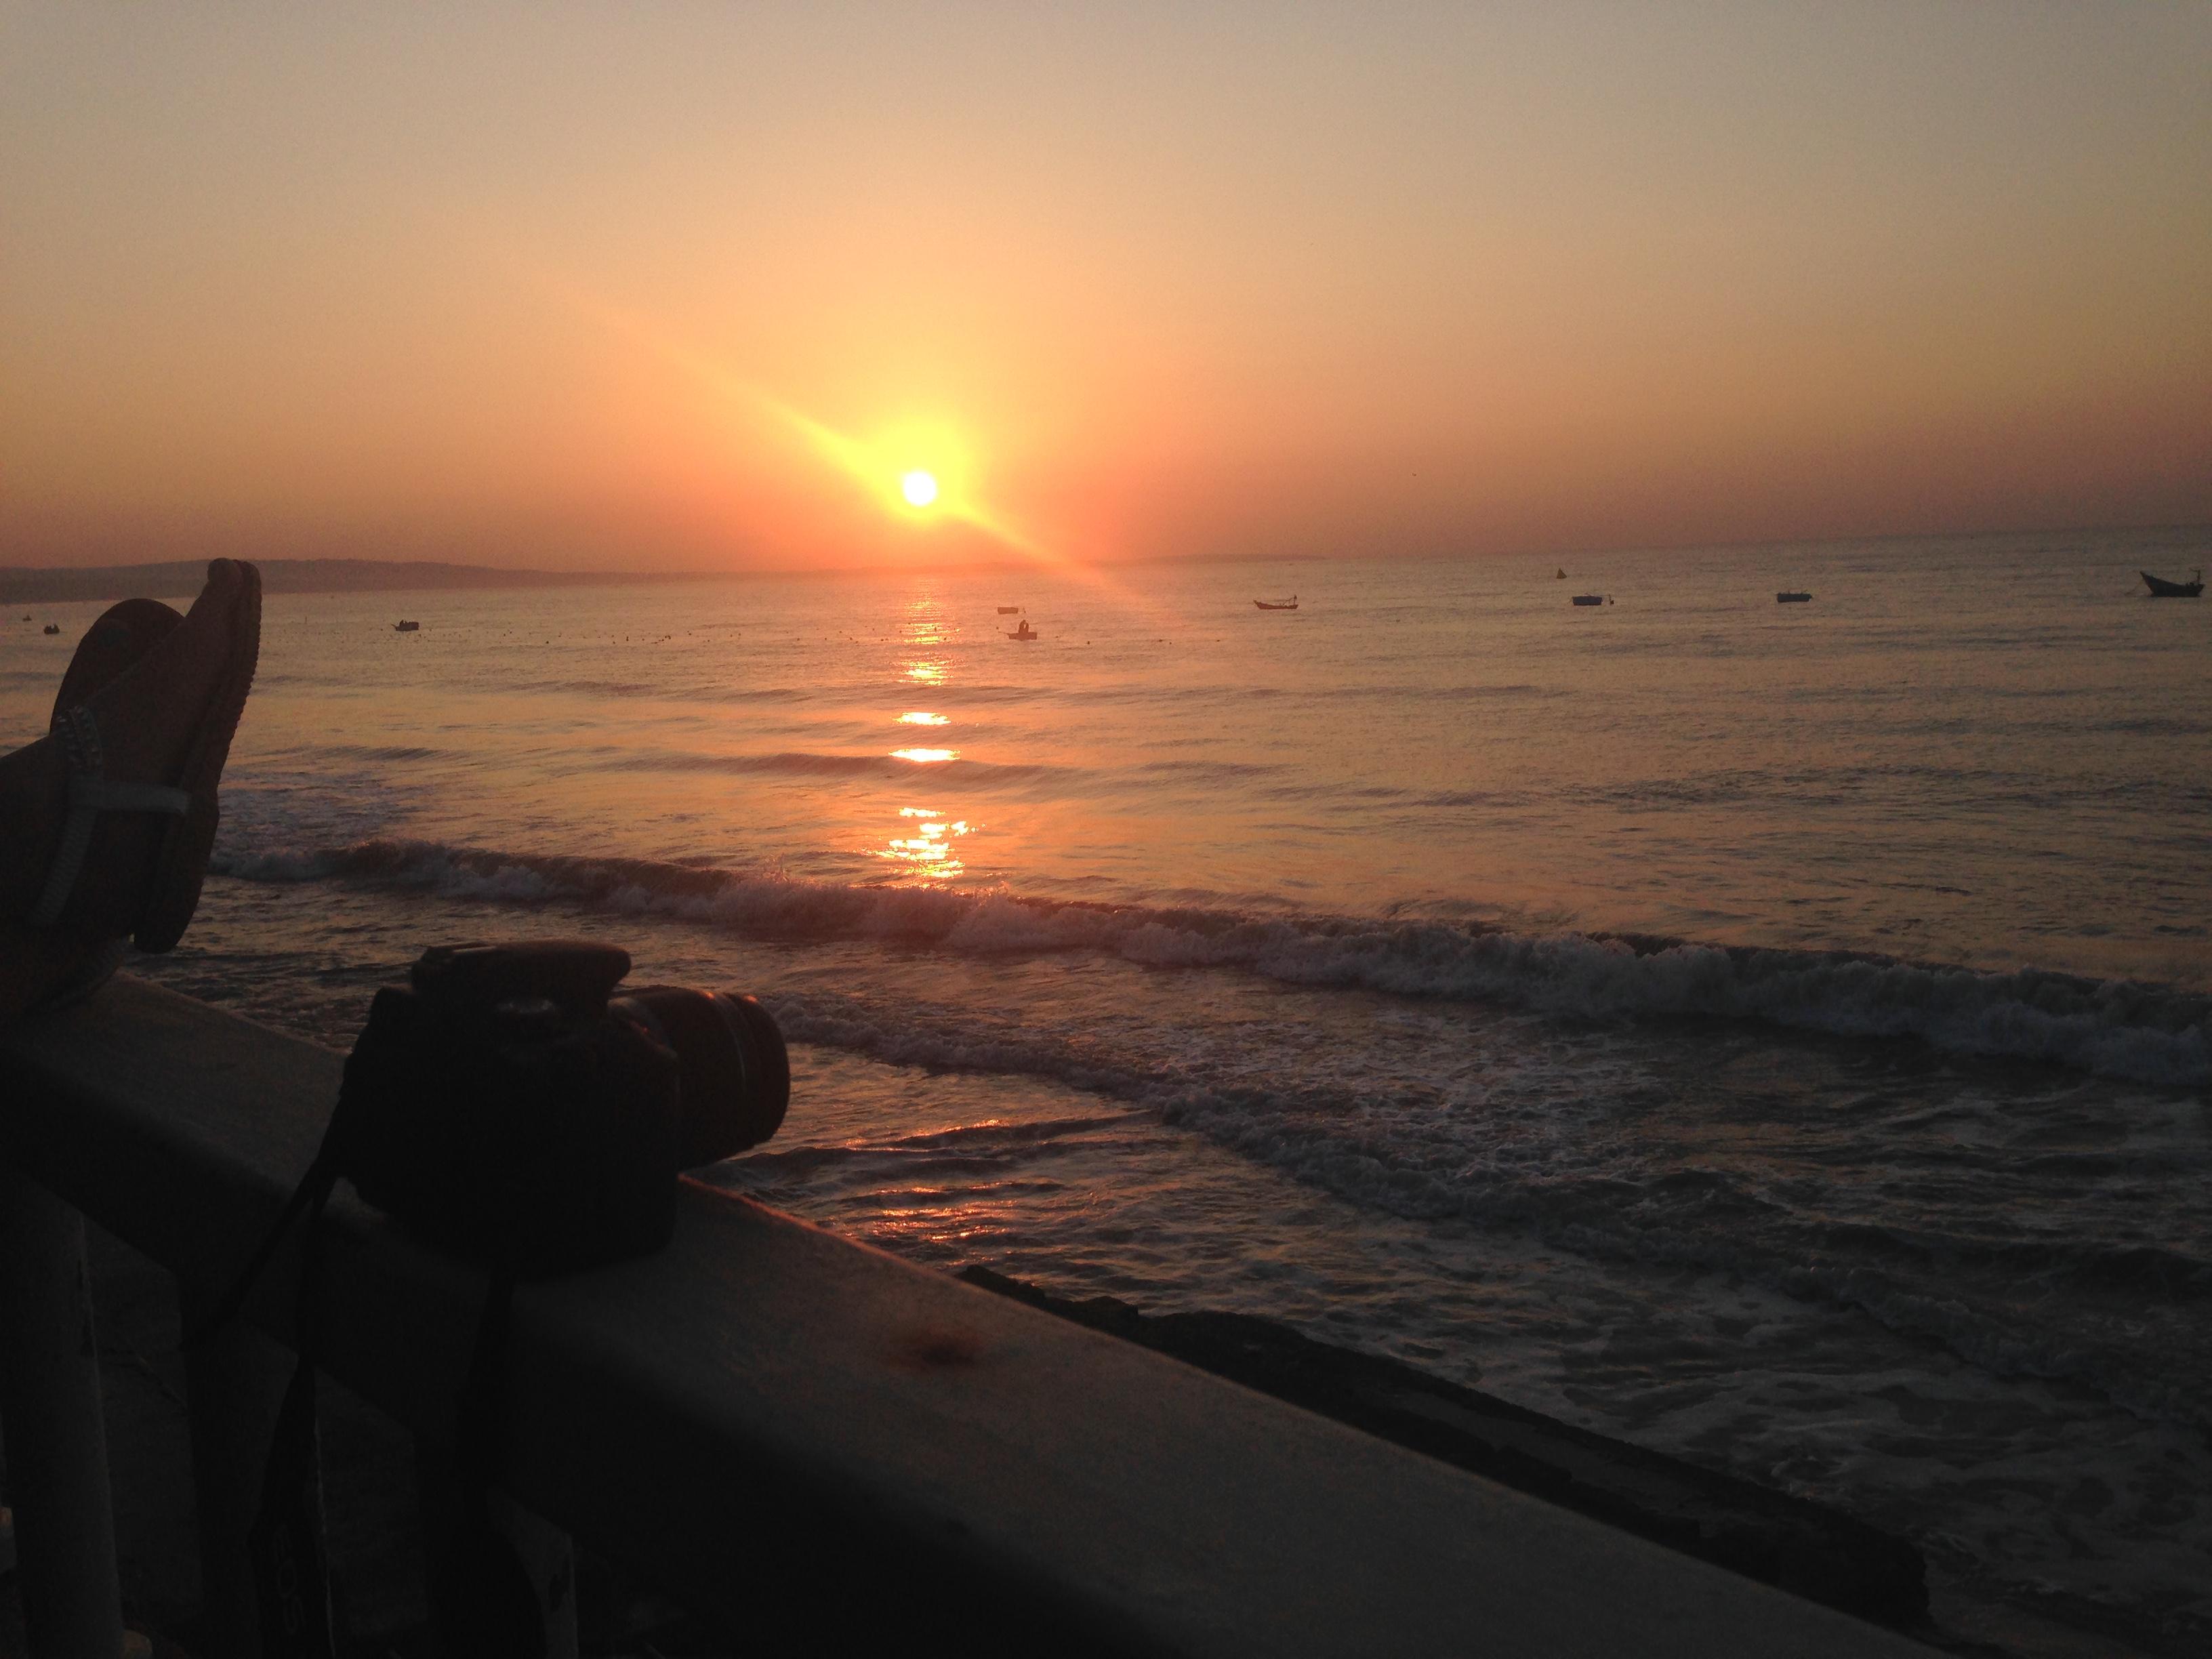 Jasmin's photo of the sunrise